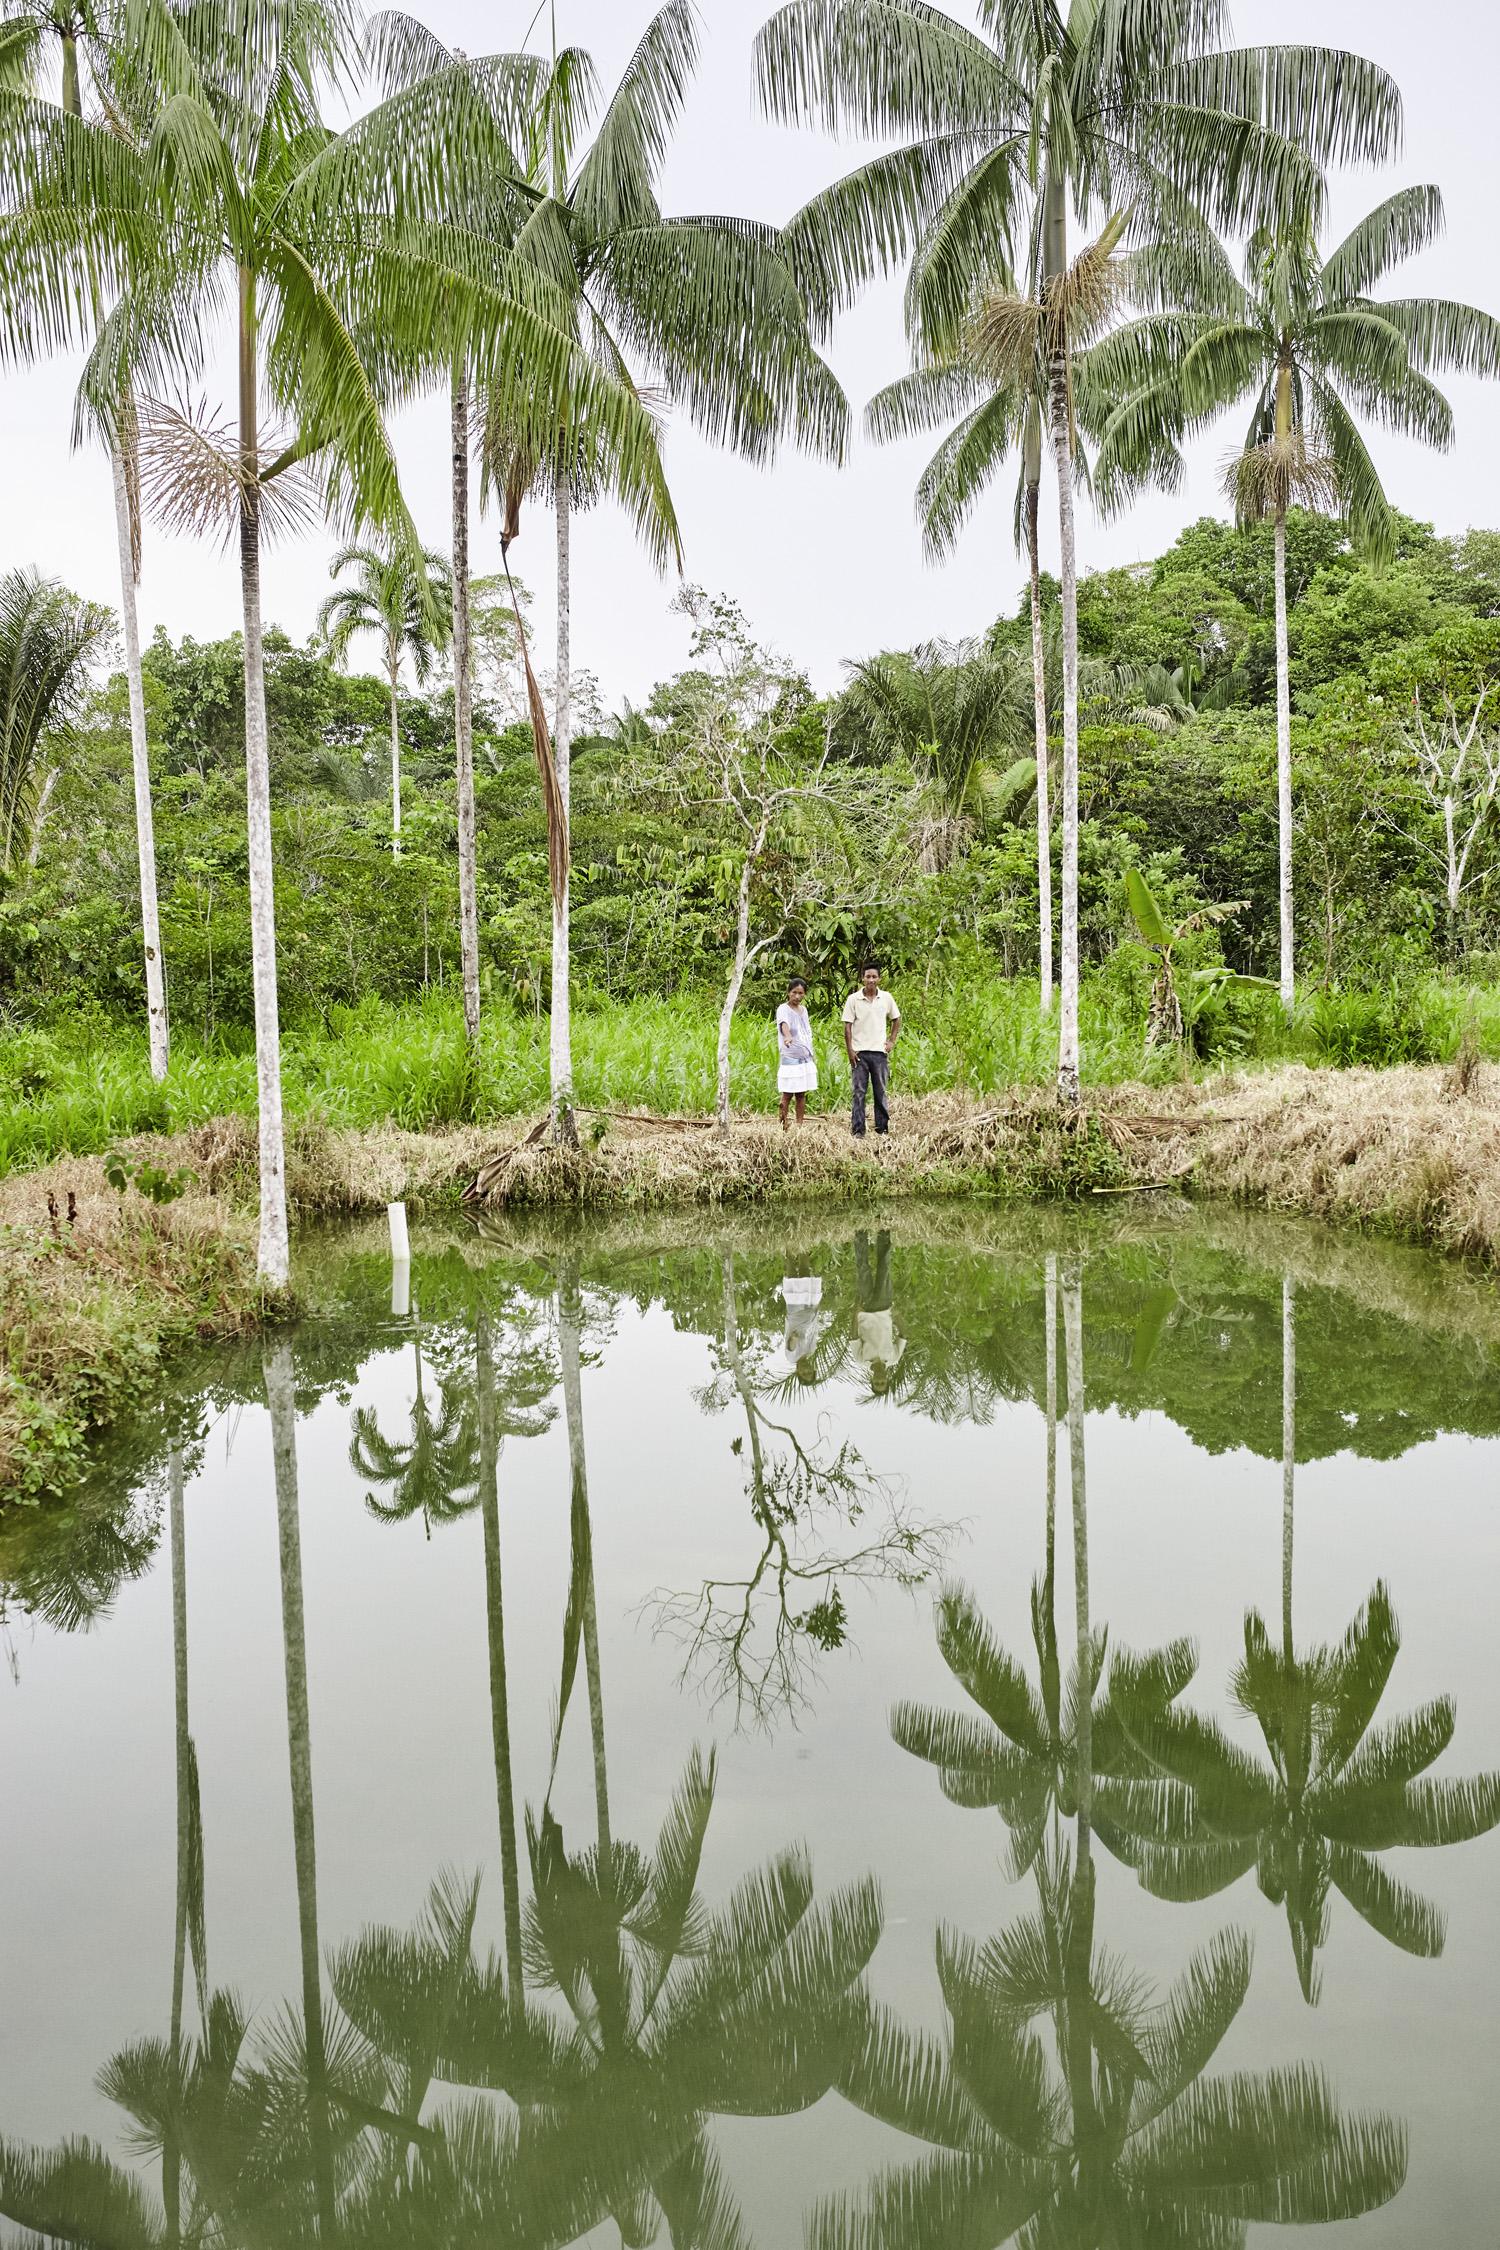 Poverty reduction_Columbia_fish_farming_Amazonia_2016-07-17_Columbia_MG_1198.jpg